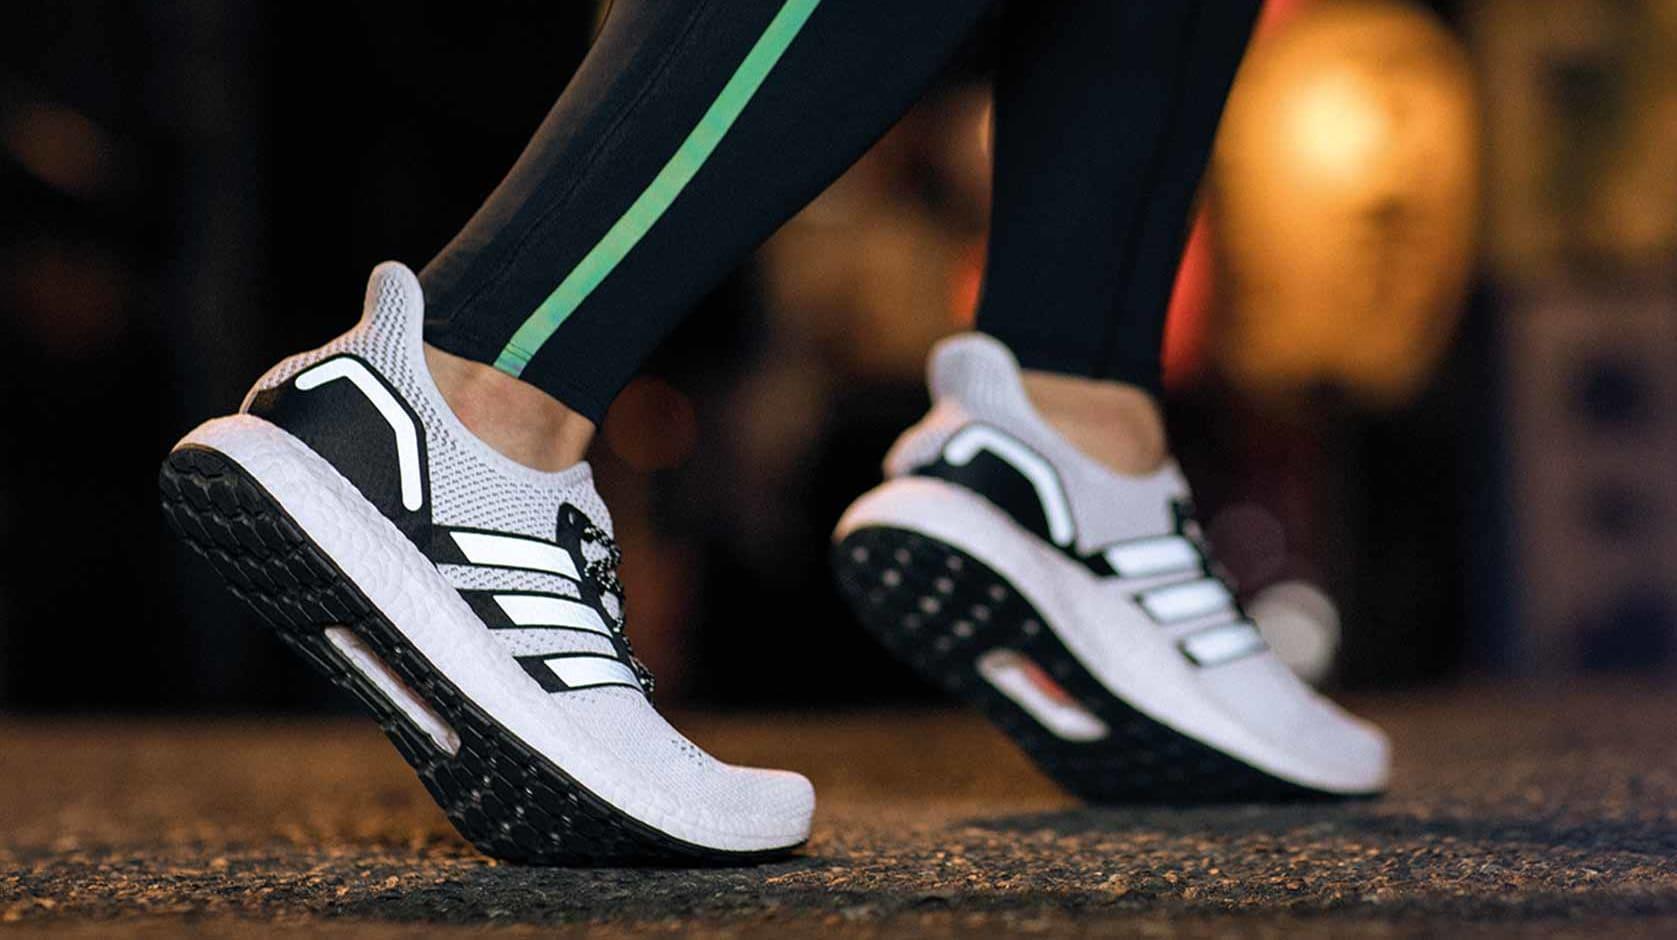 Adidas Speedfactory AM4TKY (On-Foot)